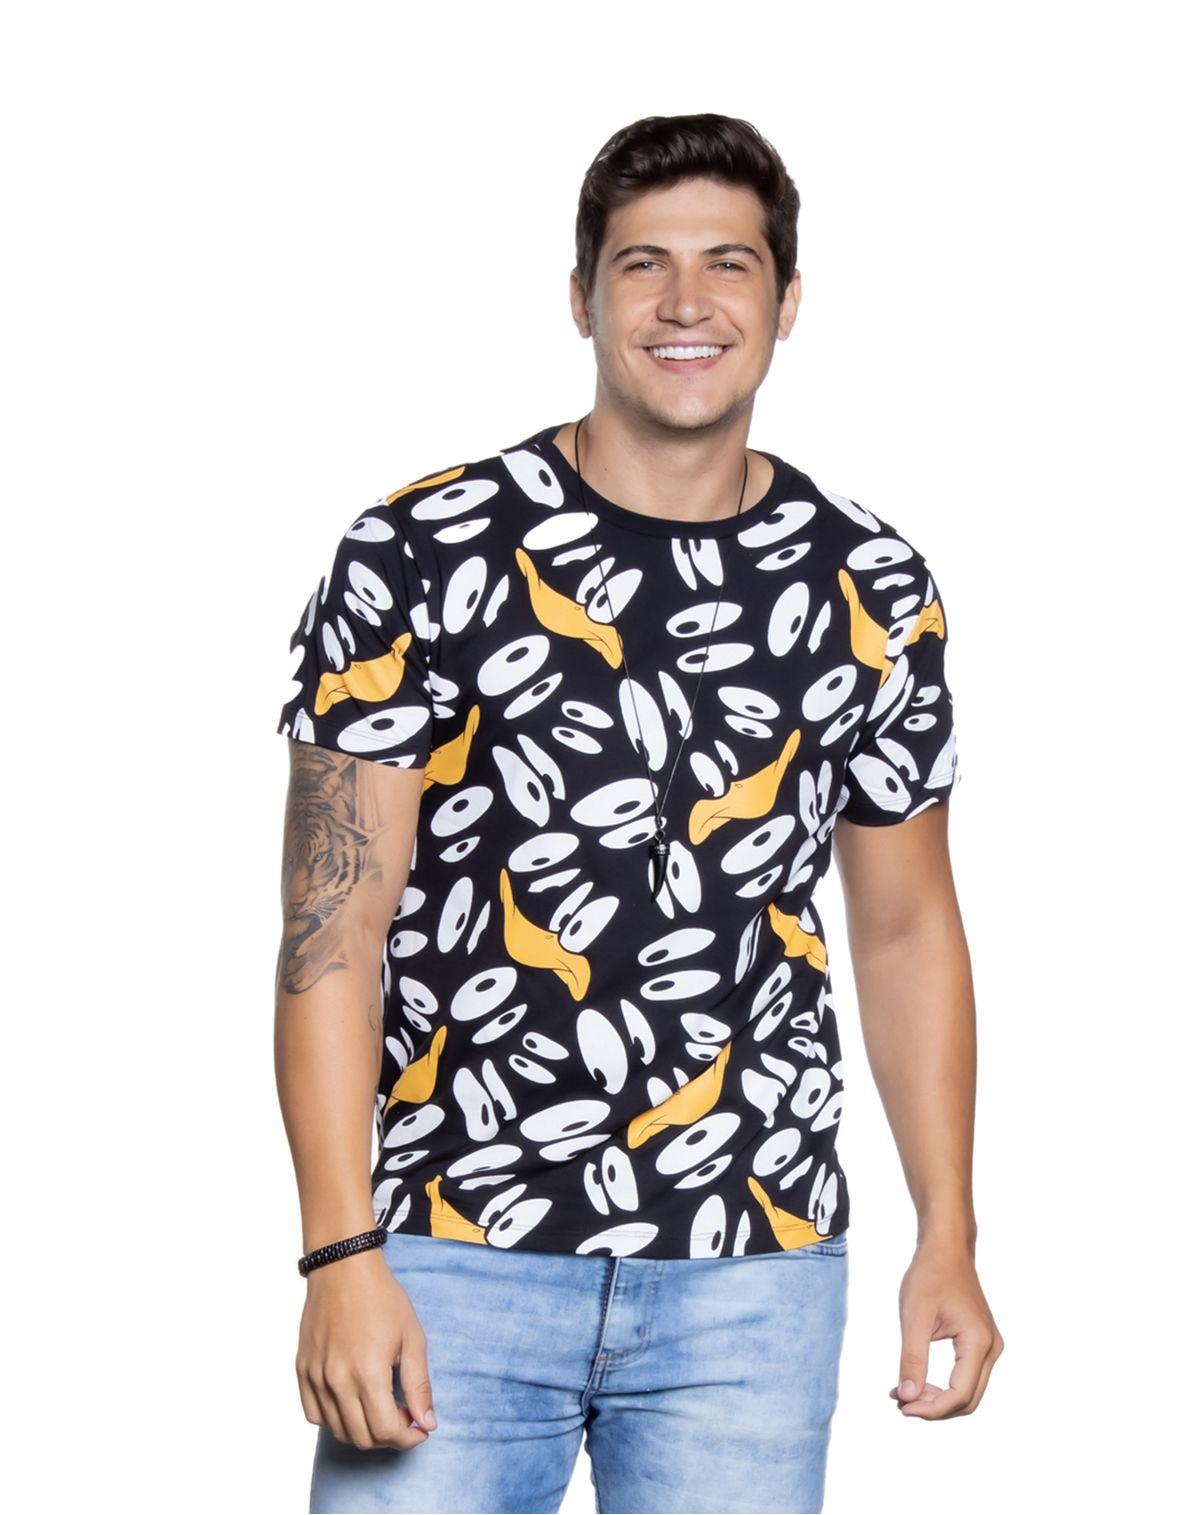 588386002-camiseta-manga-curta-masculina-patolino-looney-tunes-preto-m-332